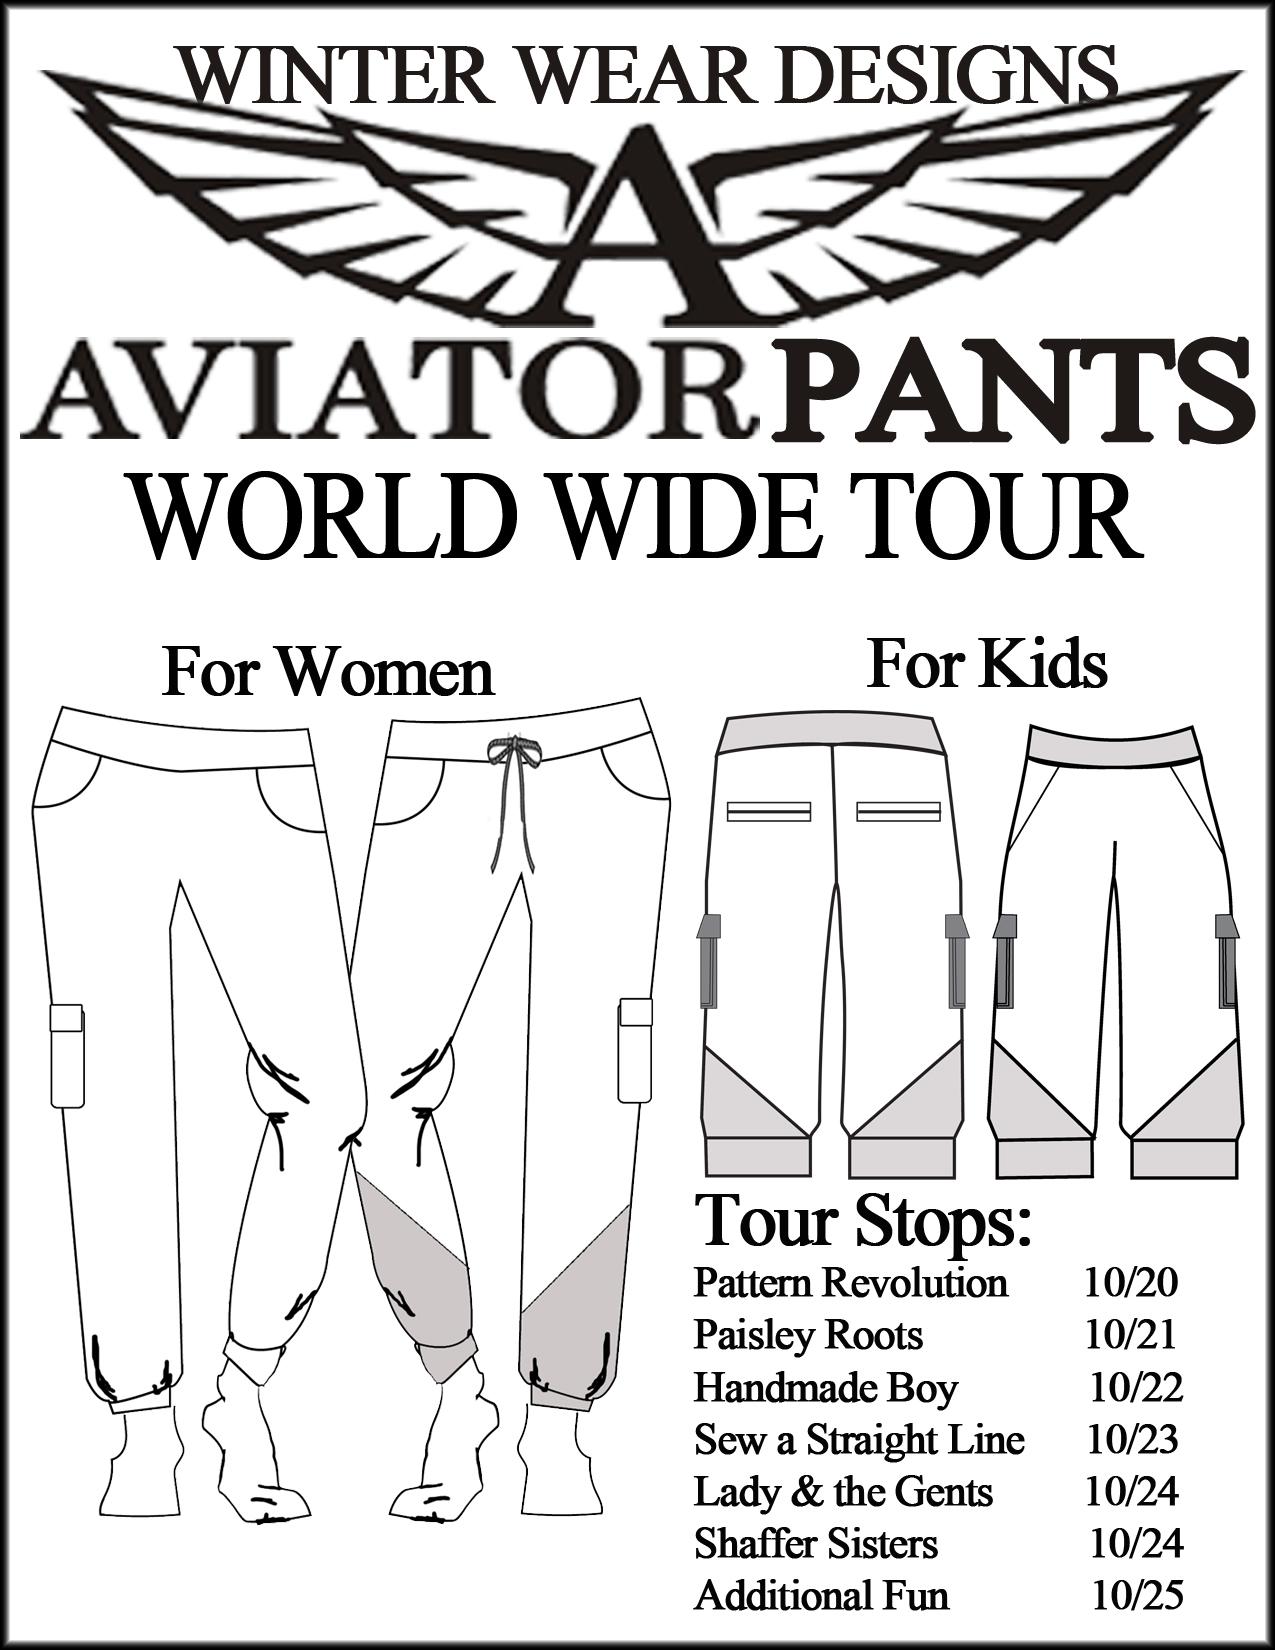 World Wide Tour- Aviator Pants- Winter Wear Designs- Pattern Revolution